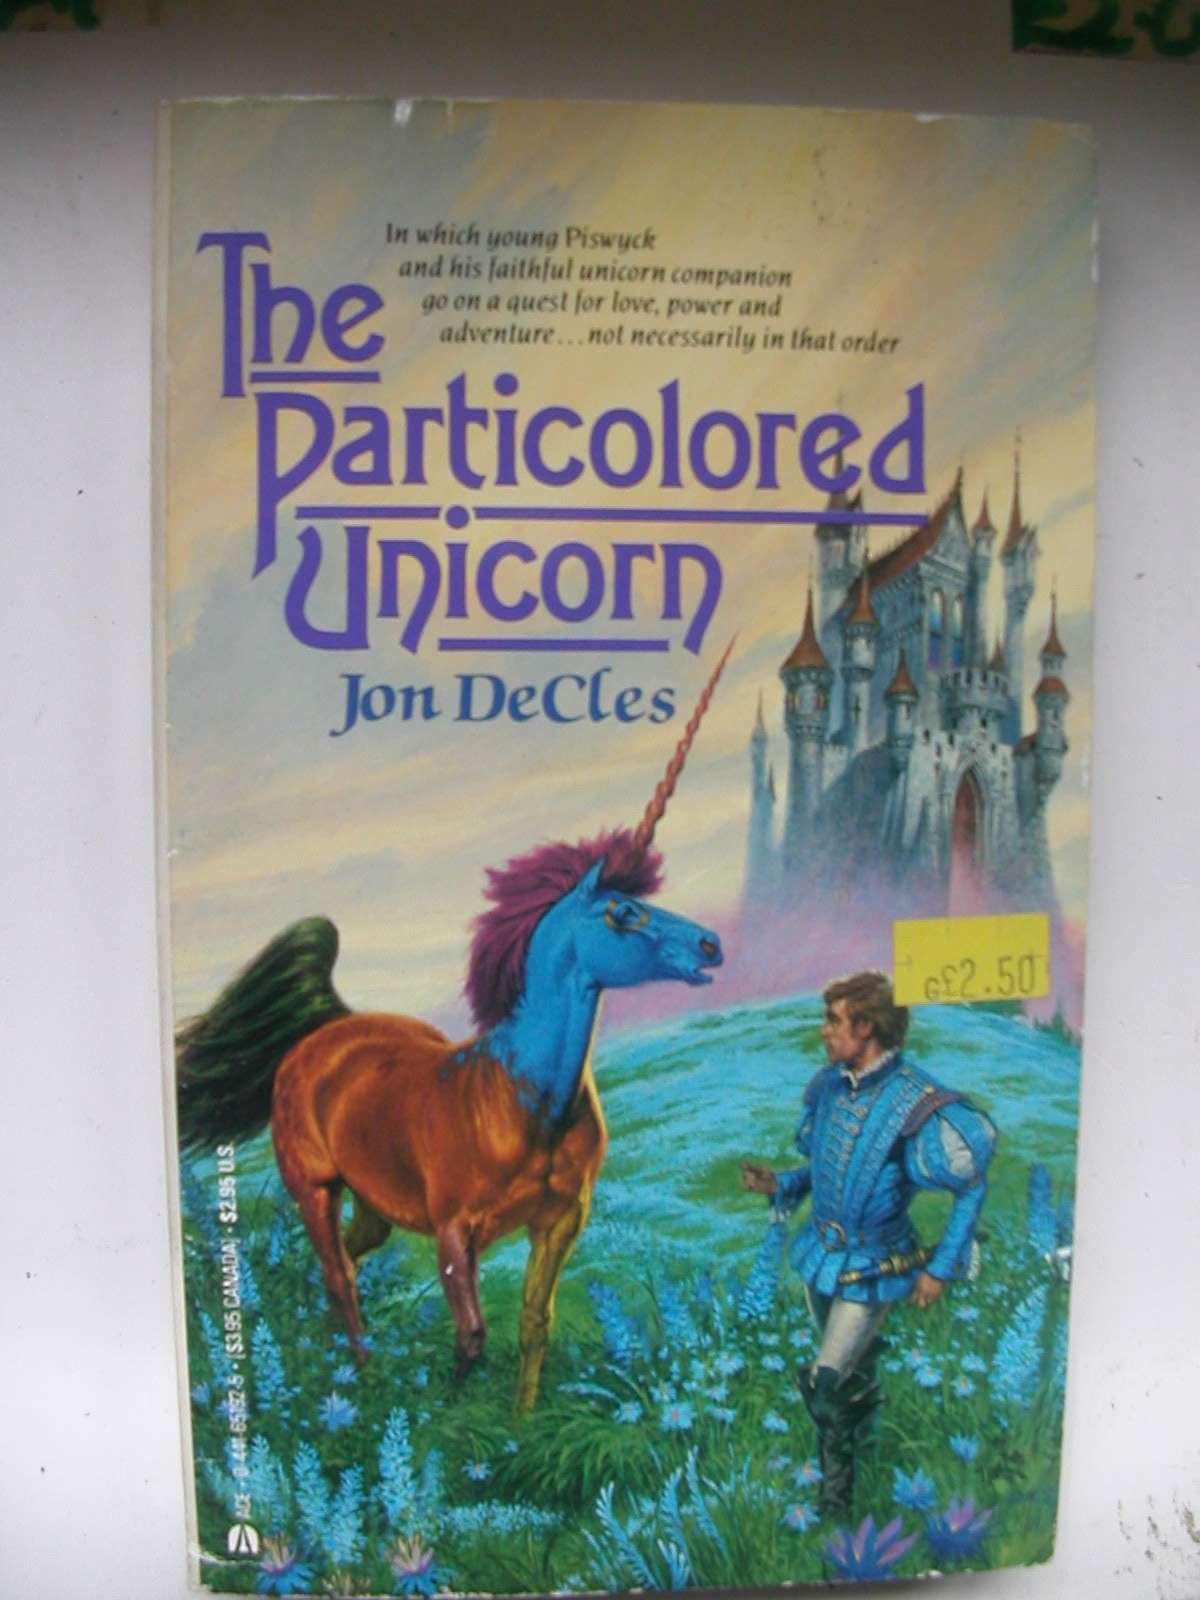 It's the punk unicorn!